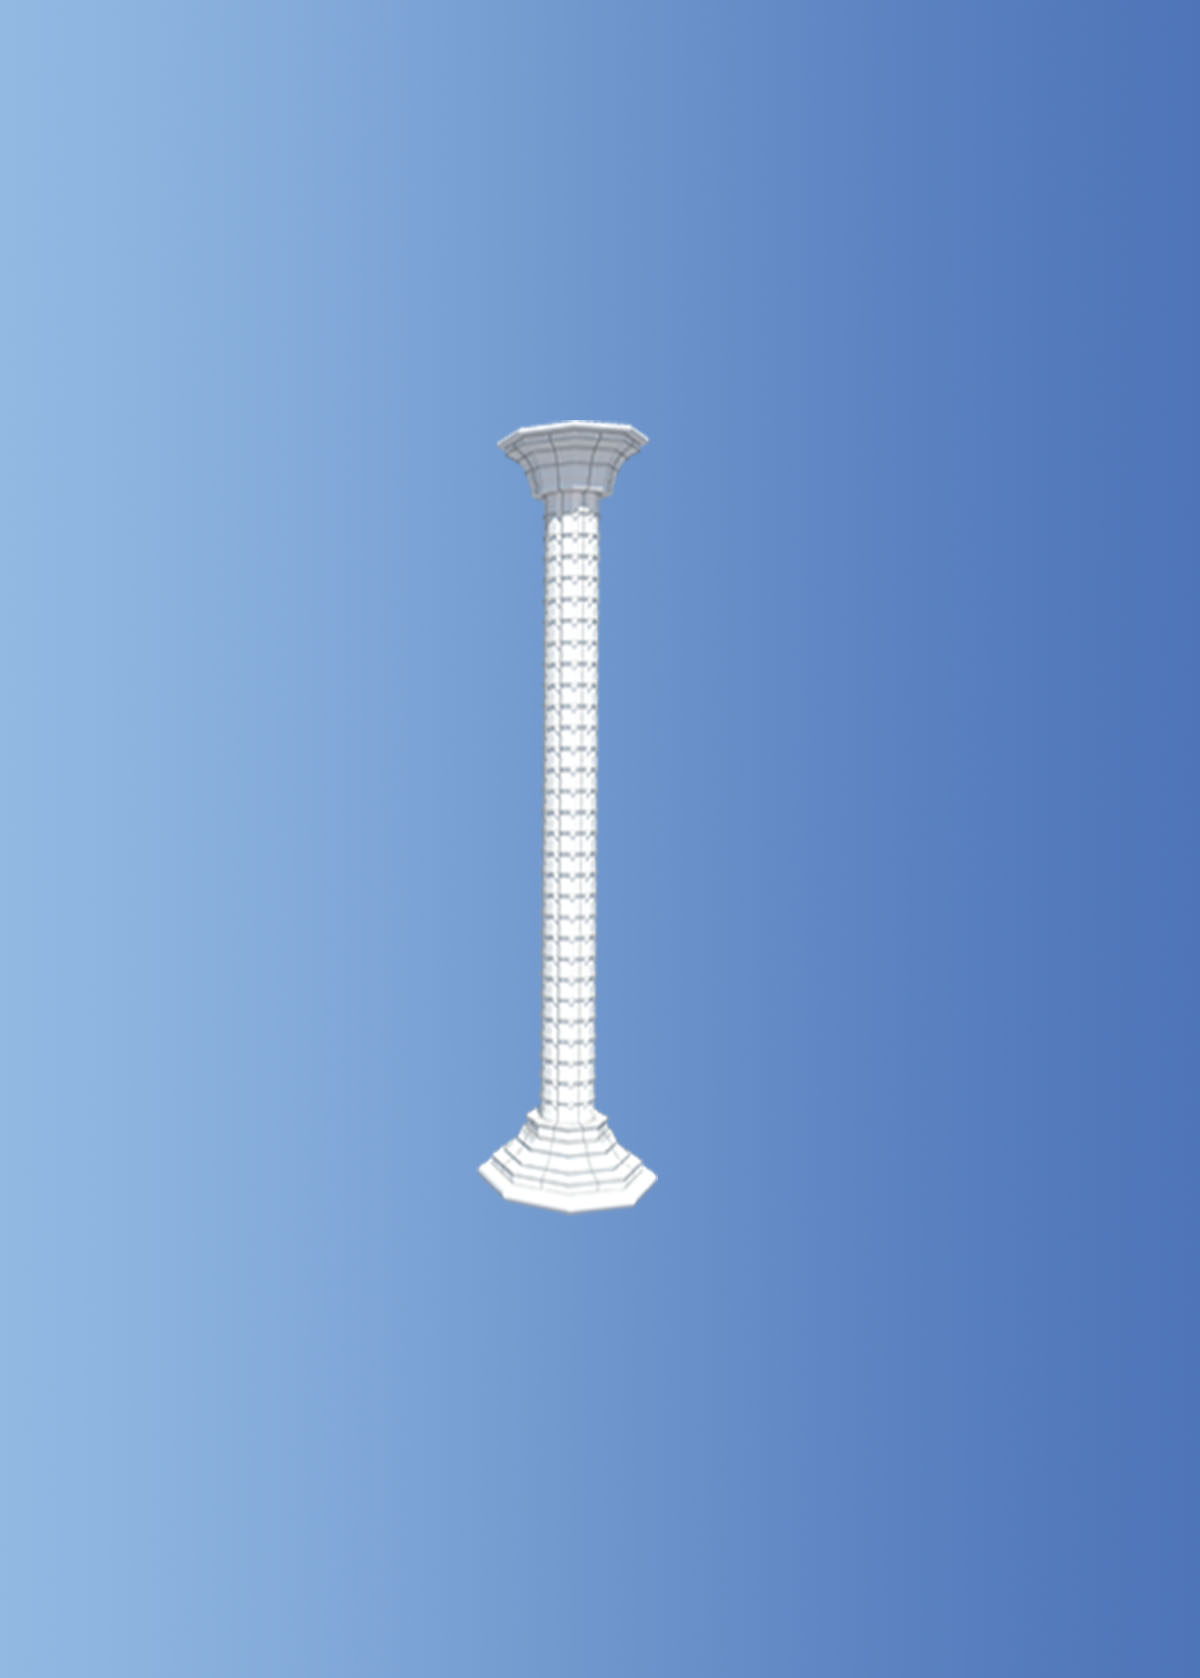 Panel columna - Panelconsa fabrica del sistema constructivo emmedue m2